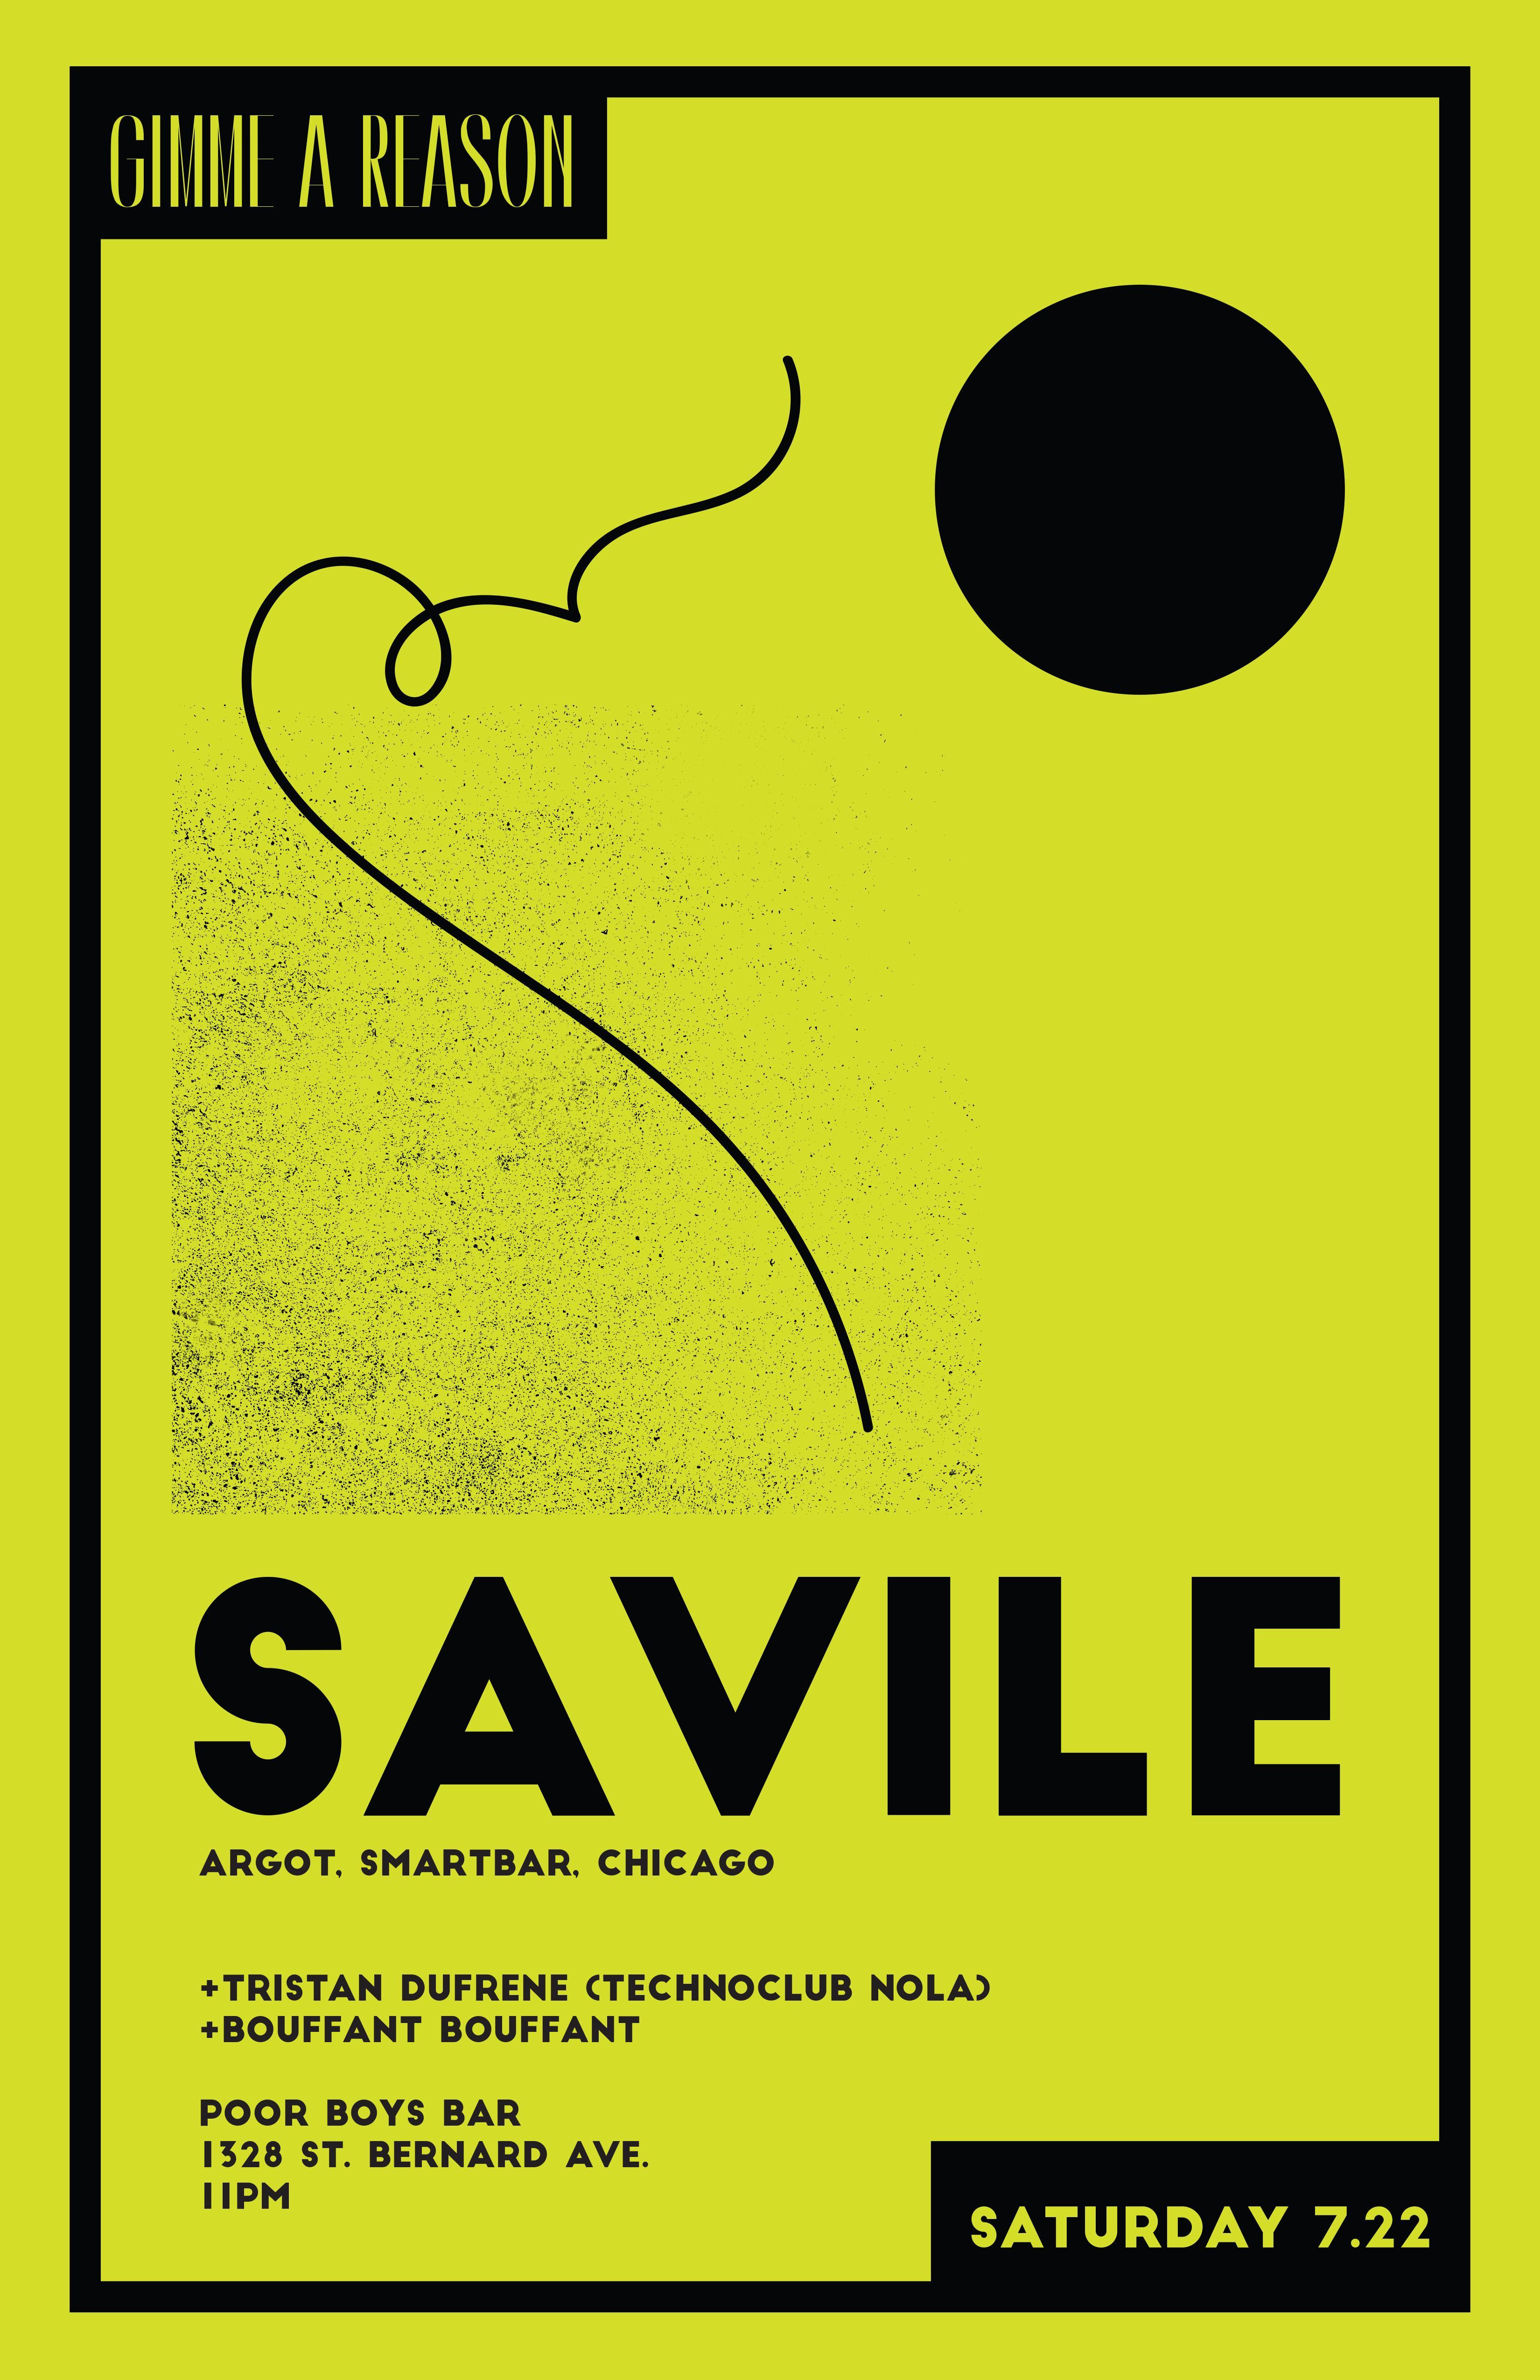 Gimme A Reason with Savile(Argot, Smartbar Ch